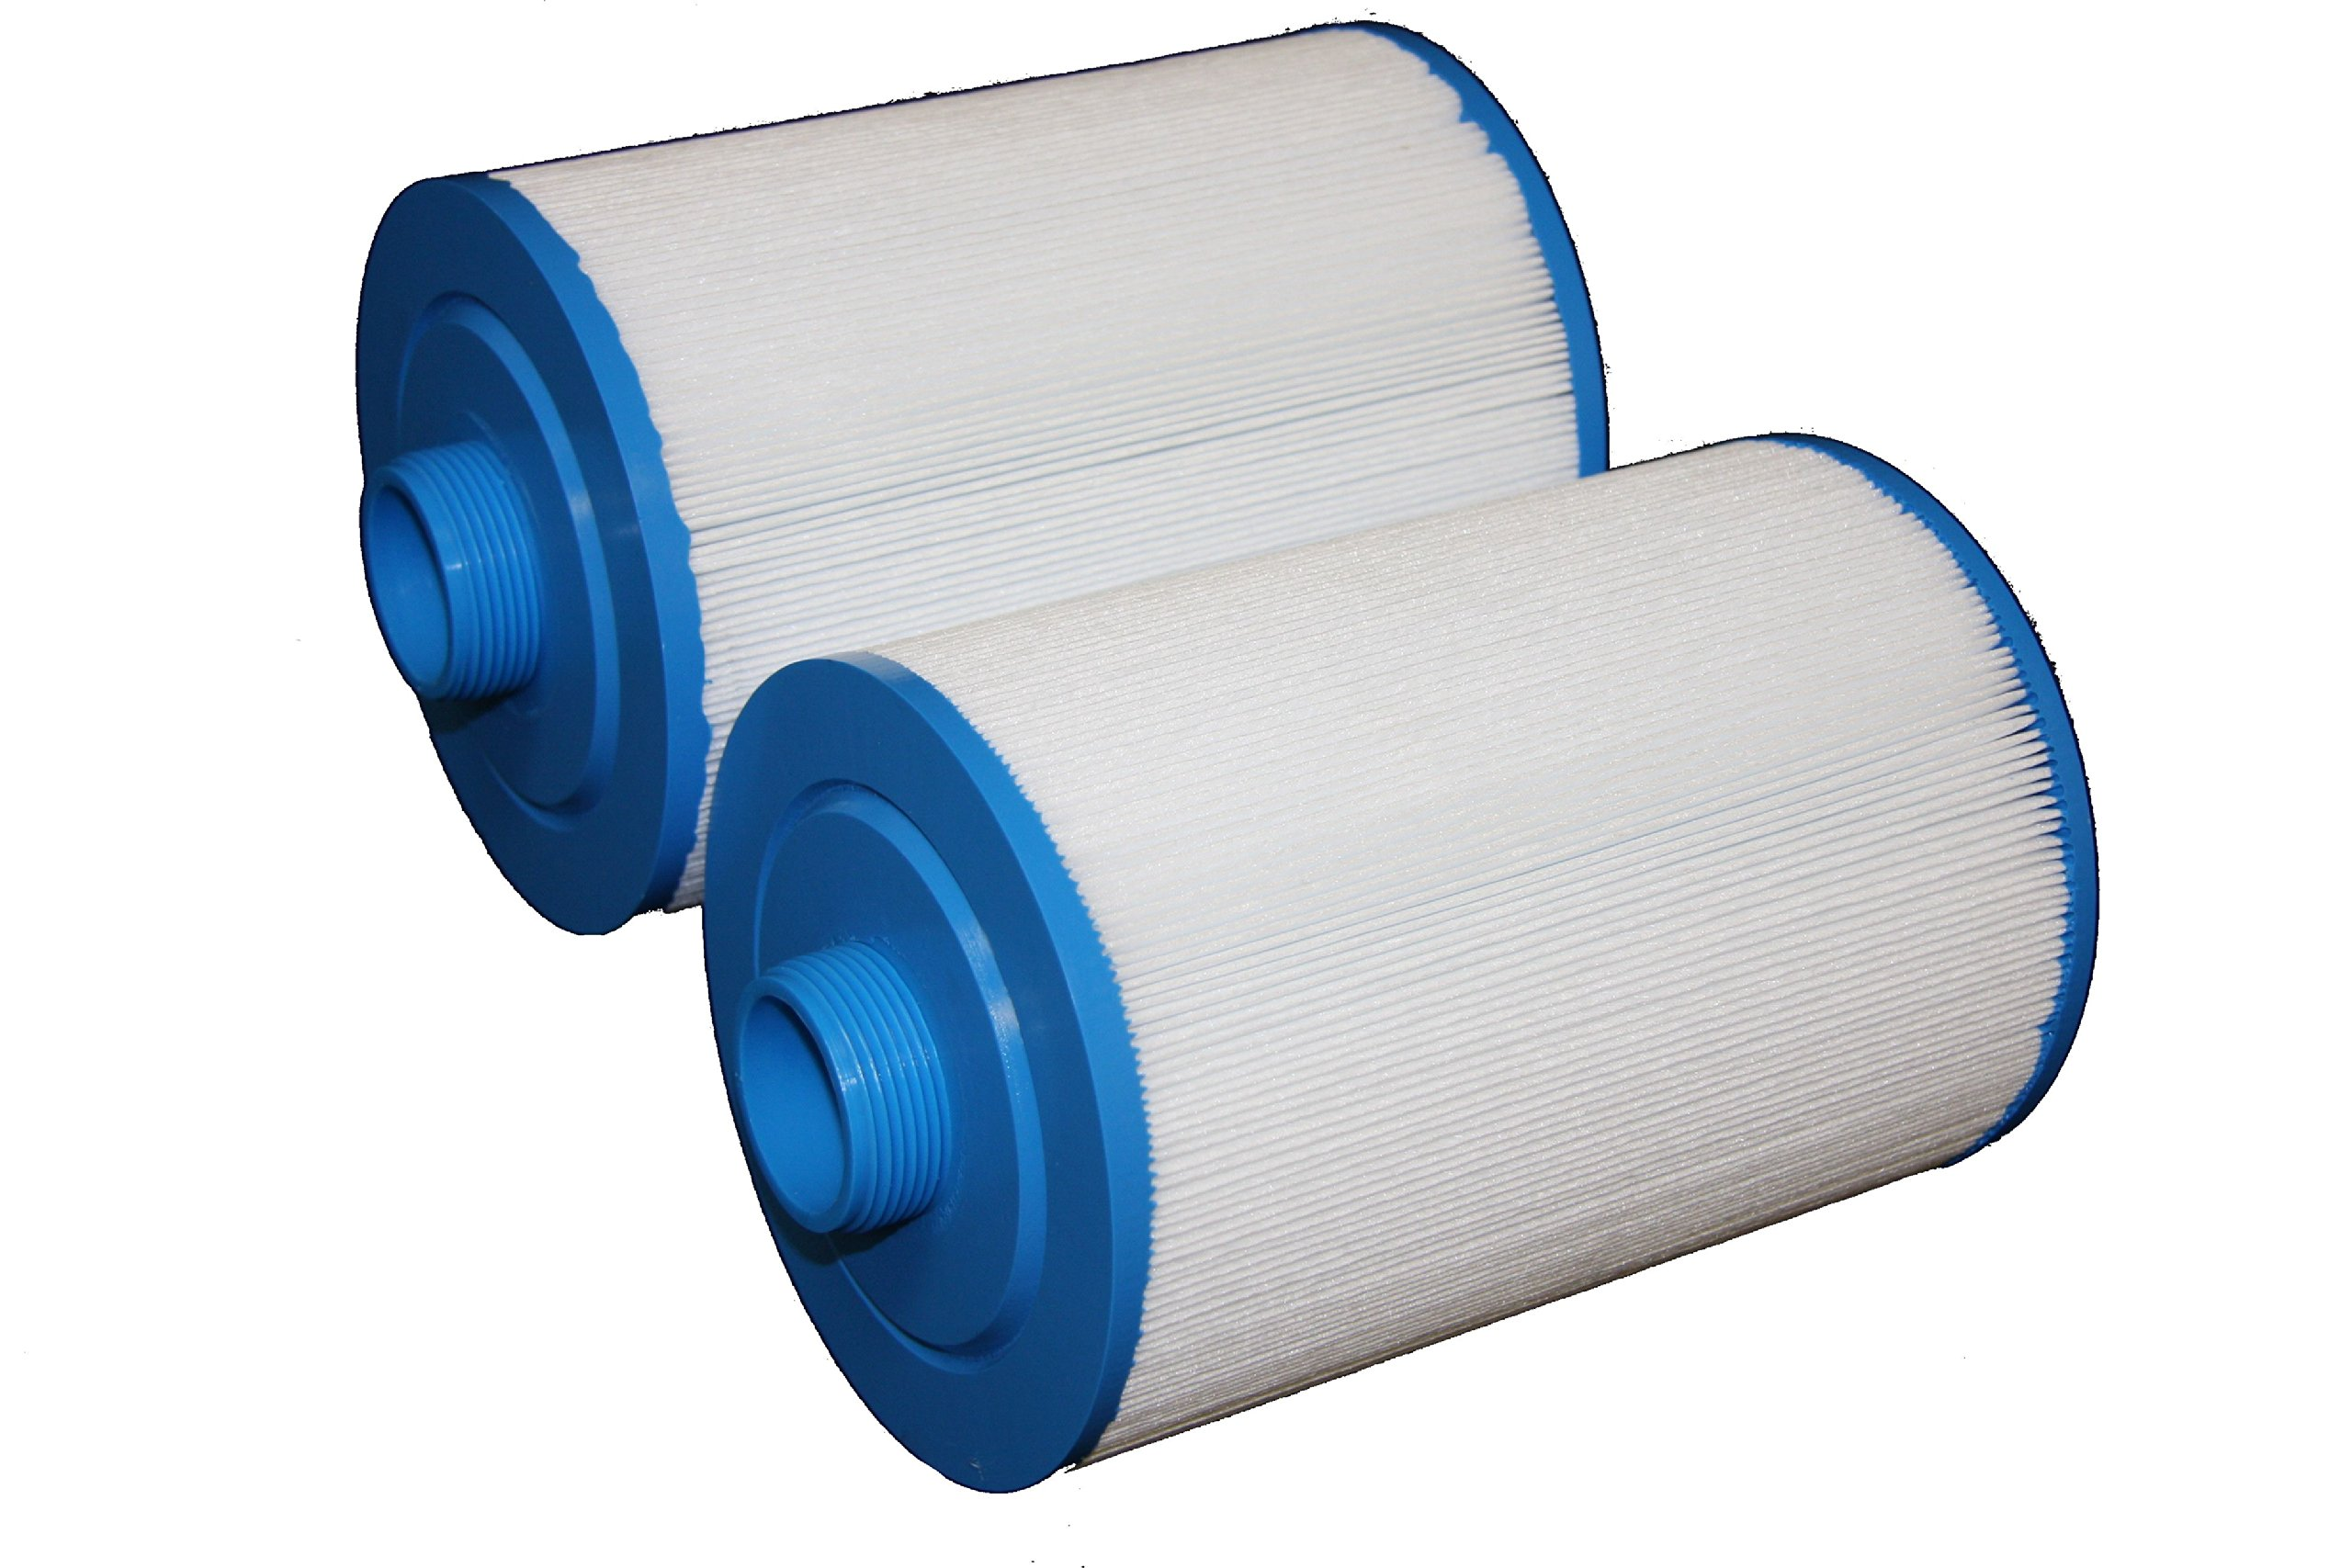 2 pack Guardian Spa filter fits-Pleatco: PSG25P4, Unicel: 4CH-20, Filbur: FC-0185, saratoga